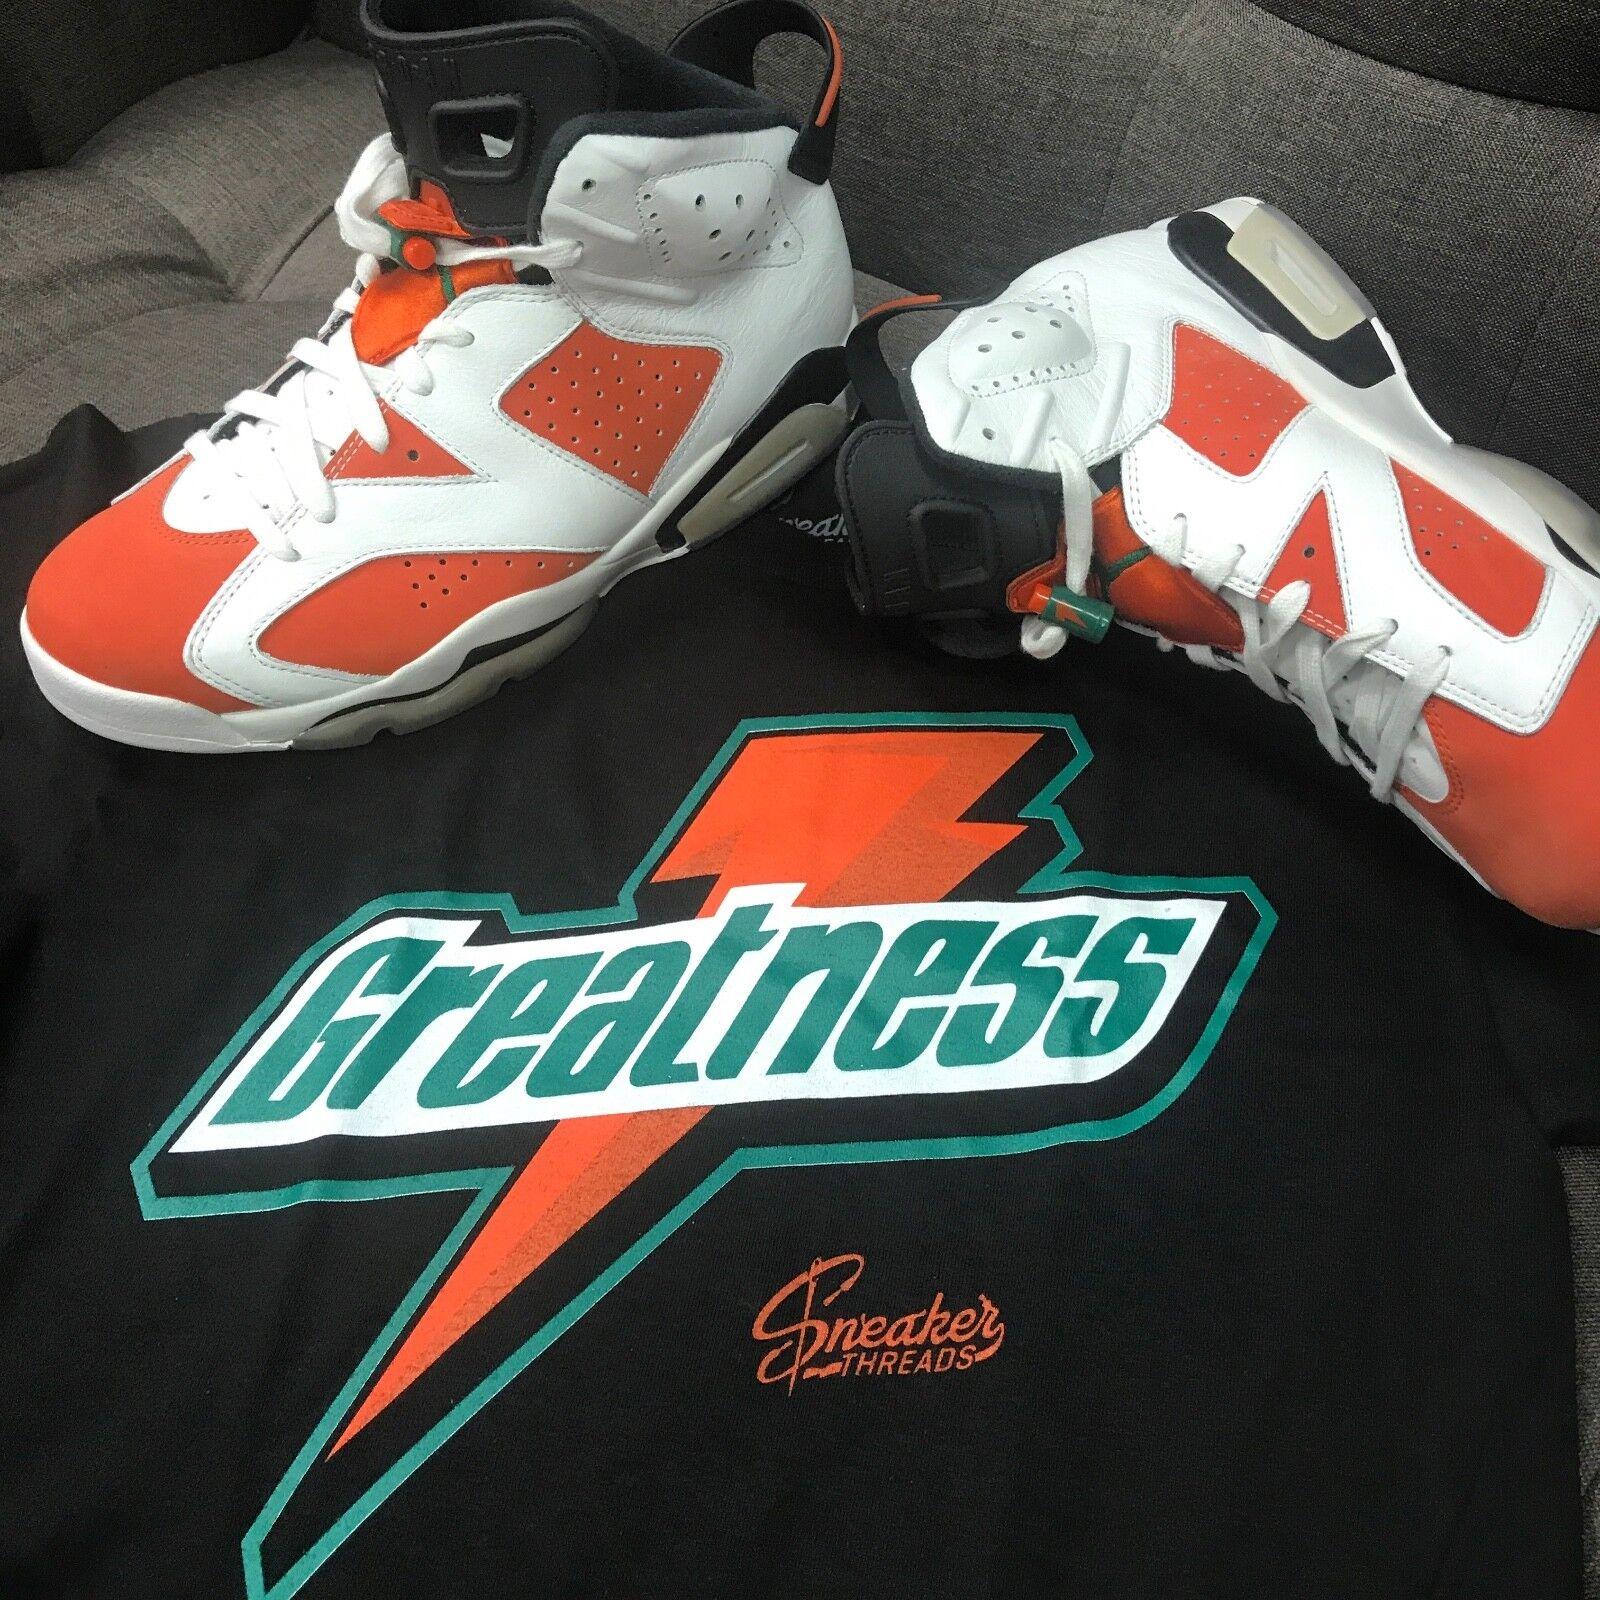 64ff7af26b4a Shirt Jordan 6 Gatorade Win Like Mike - Greatness Tee Match ...